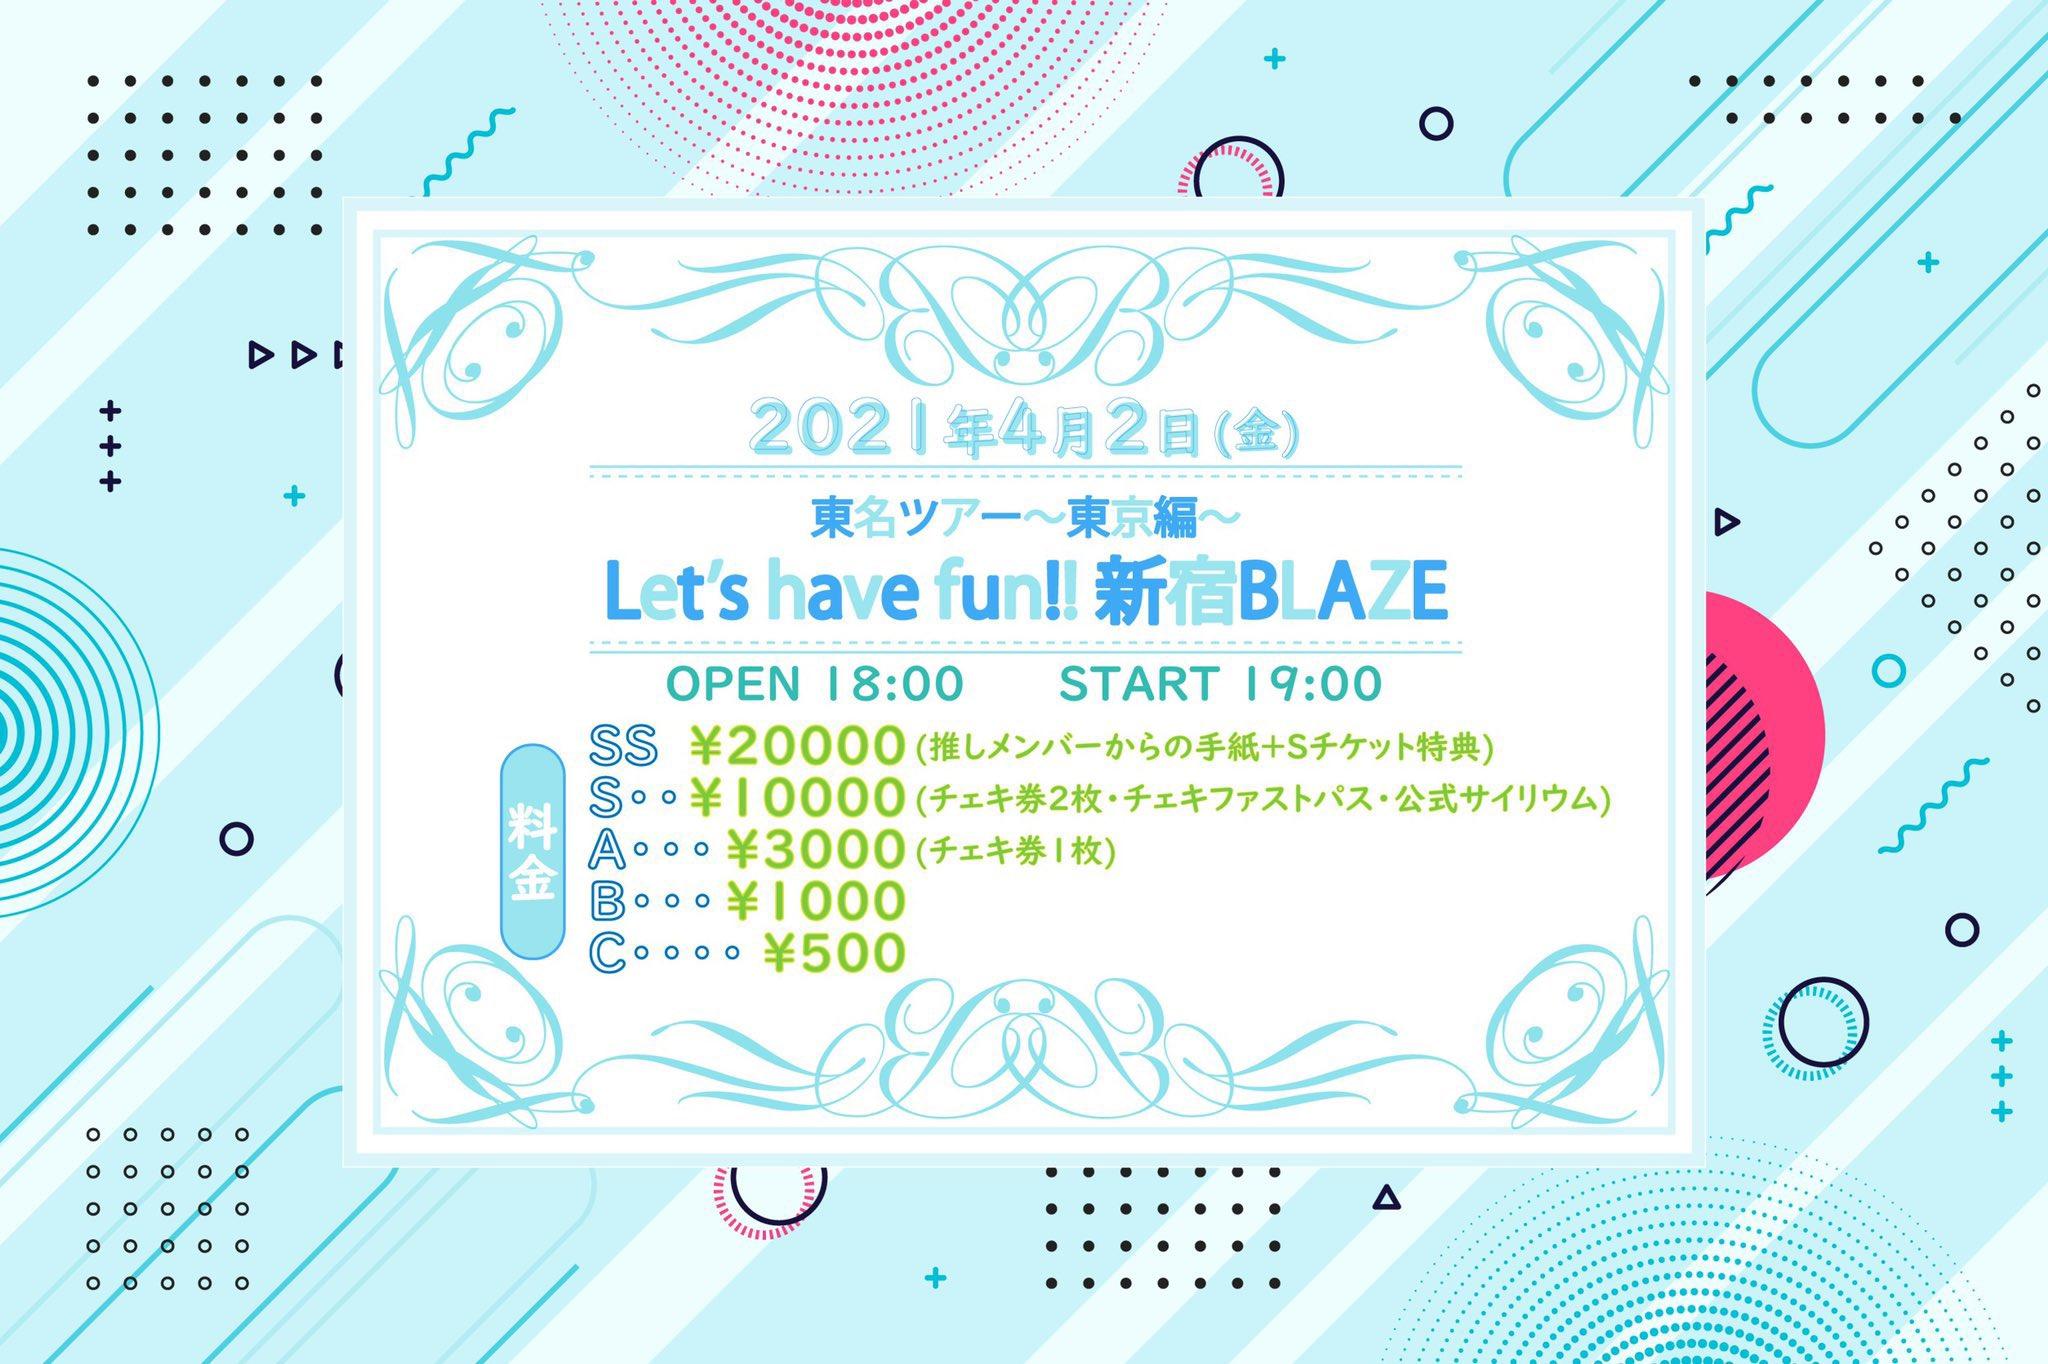 【東京】Mystear 東名ツアー 〜Let's have fun!!〜 @新宿BLAZE